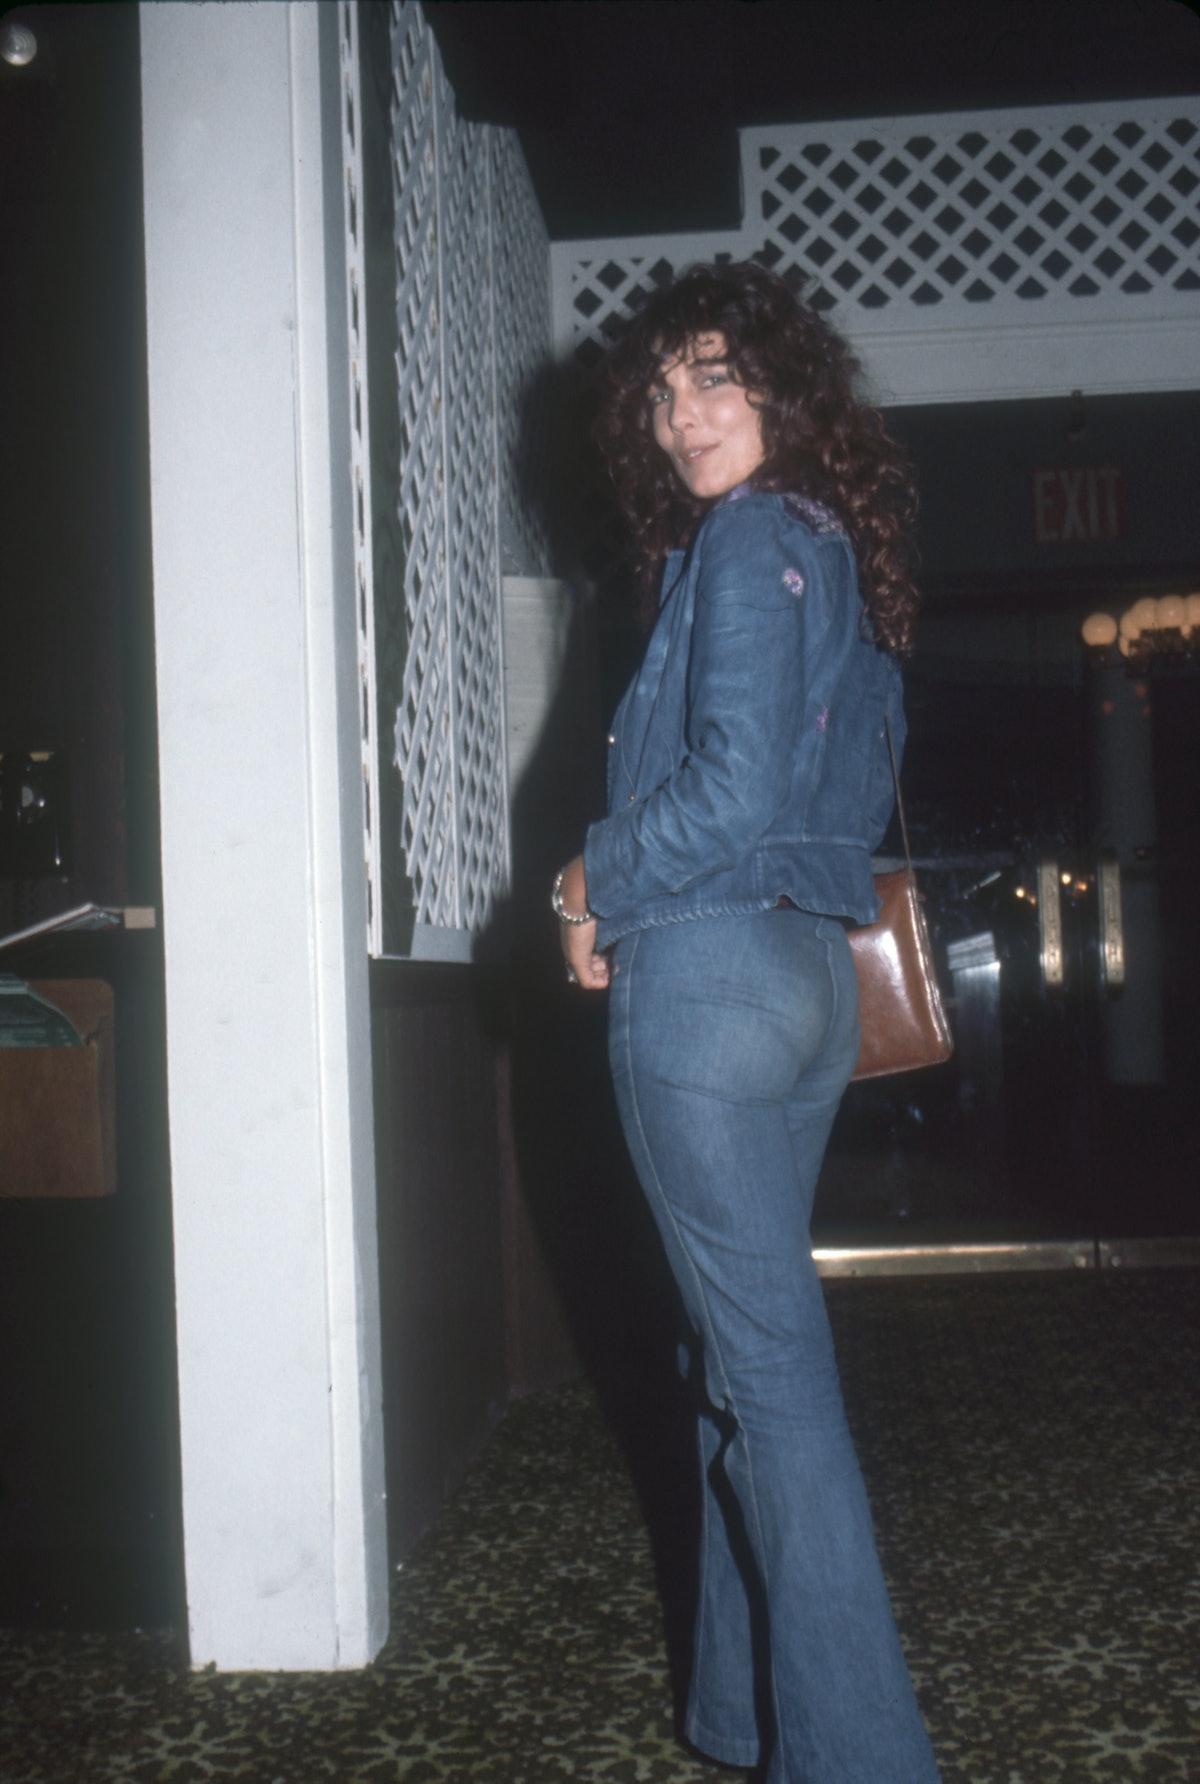 A woman wears canadian tux, denim on denim look in the 1970s.